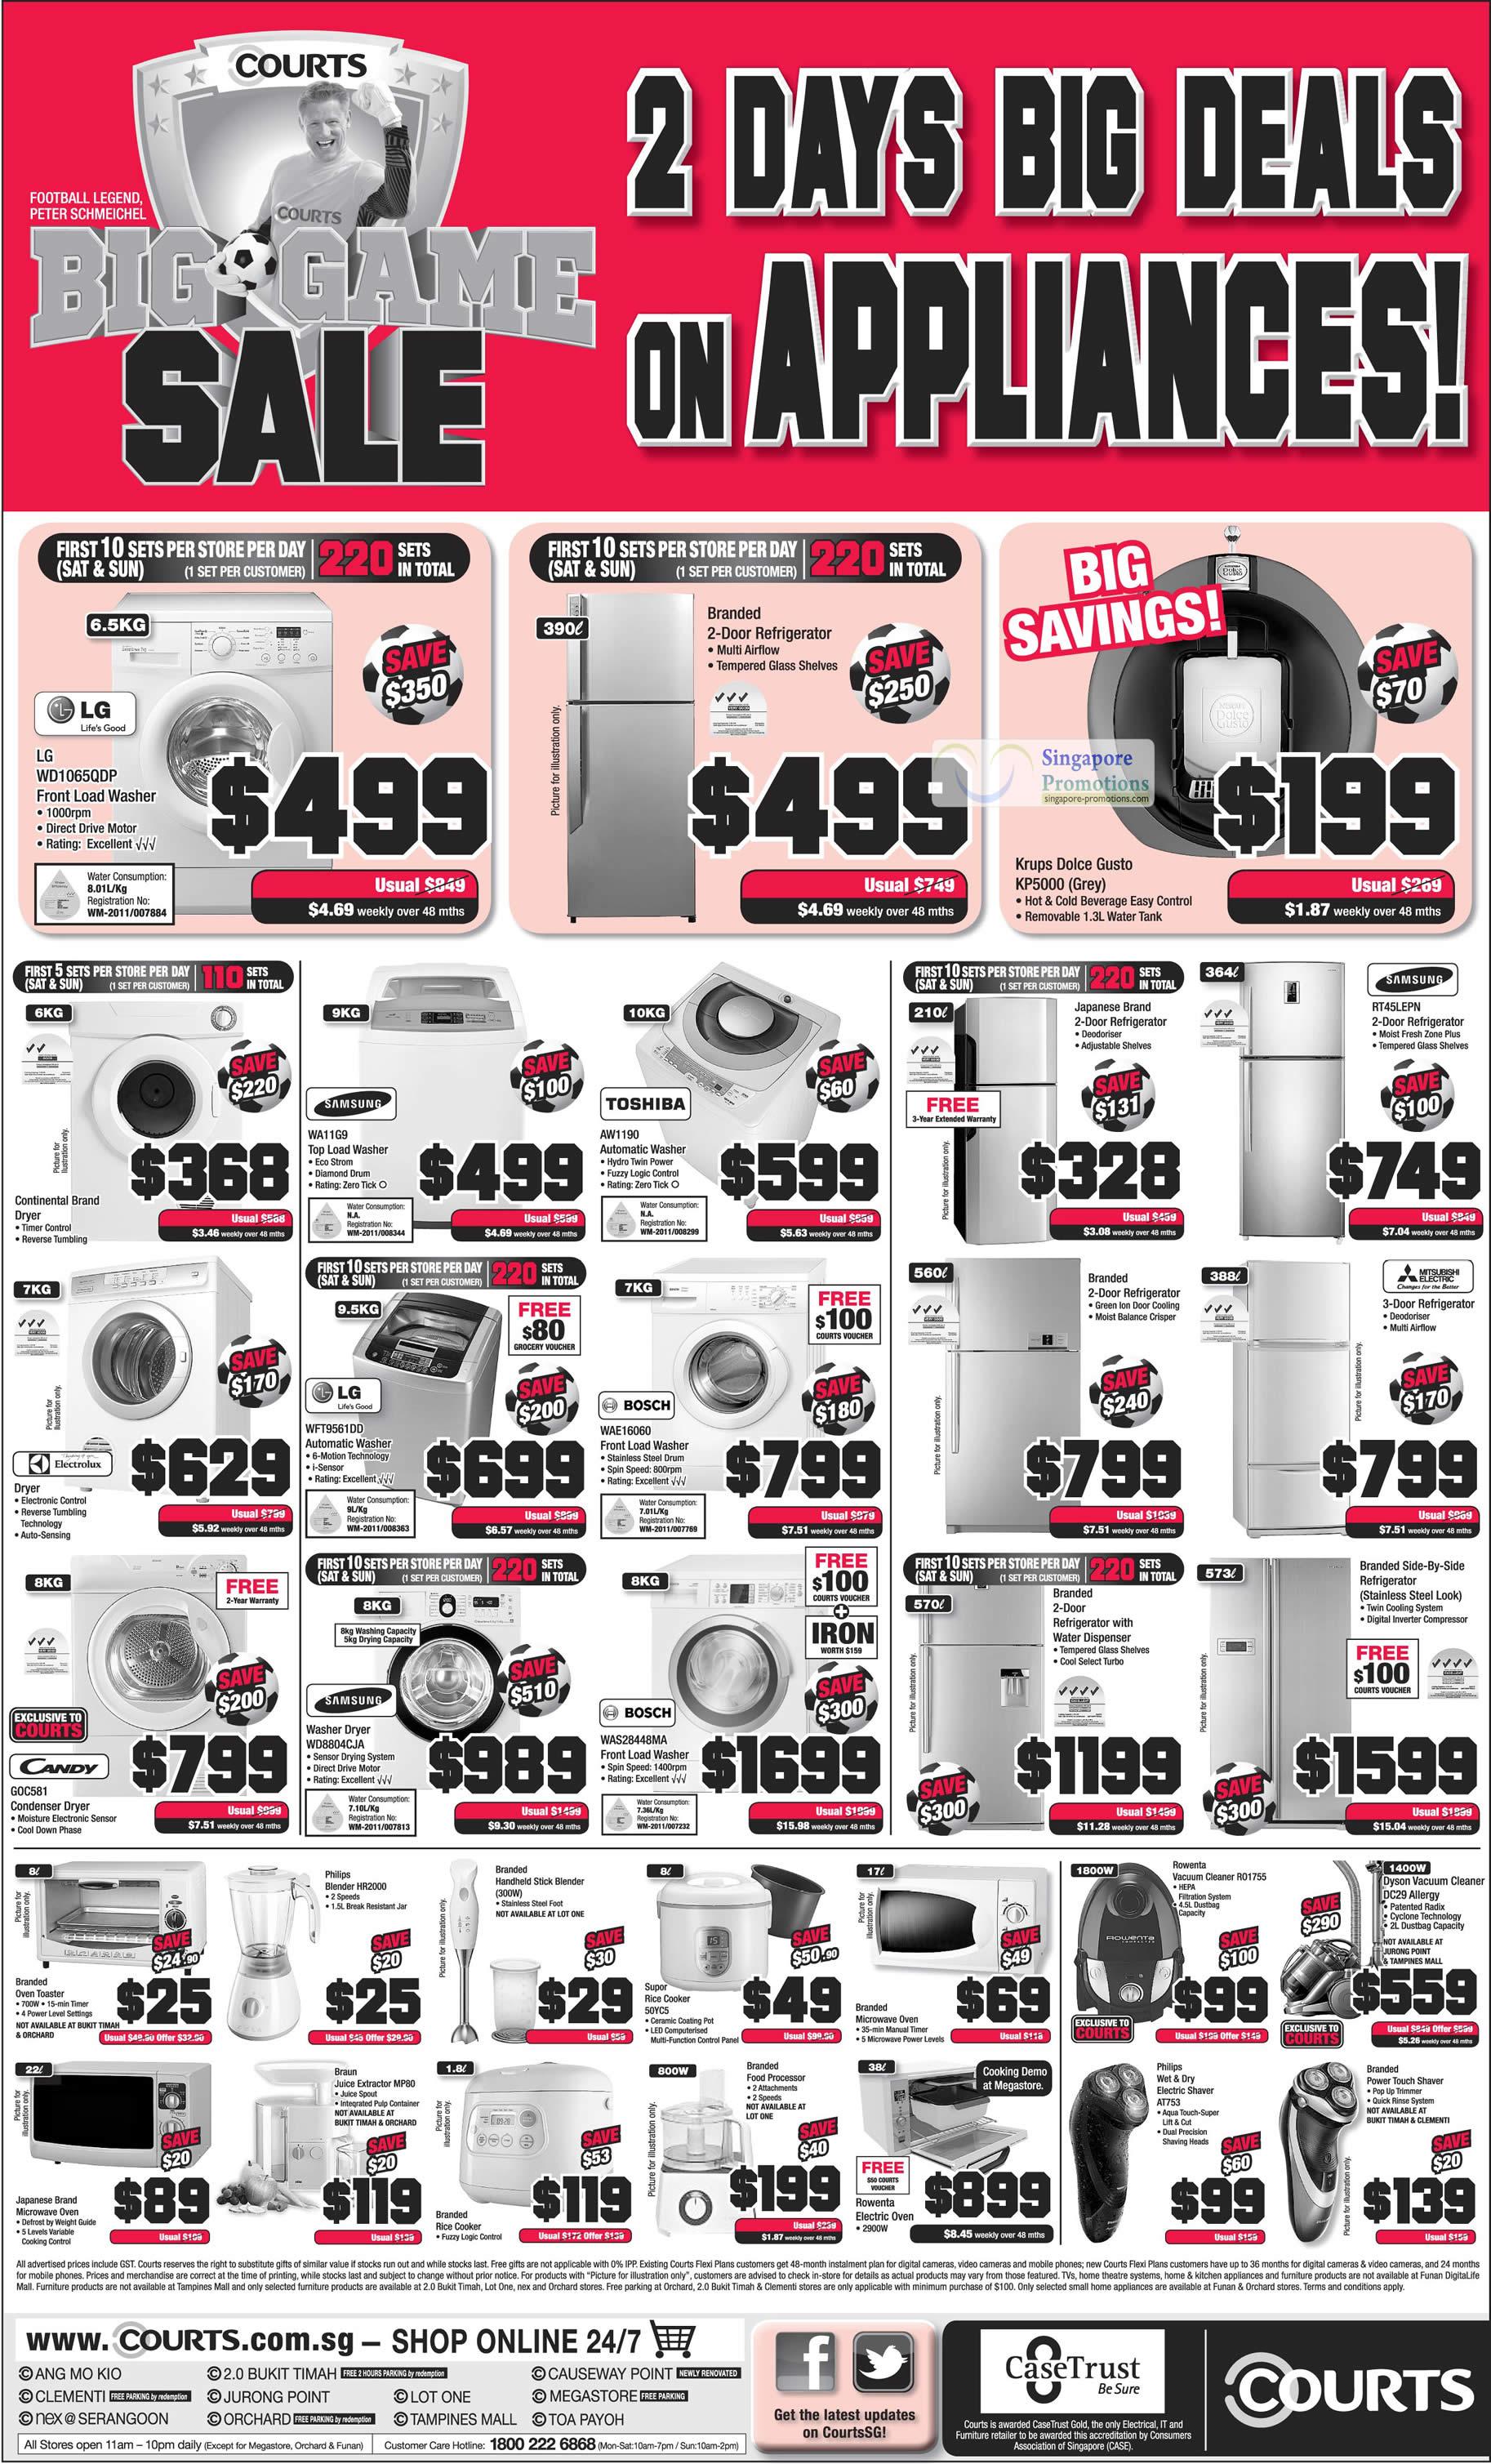 Washers, Fridges, Vacuum Cleaner, LG, Toshiba, Samsung, Bosch, Candy, Electrolux